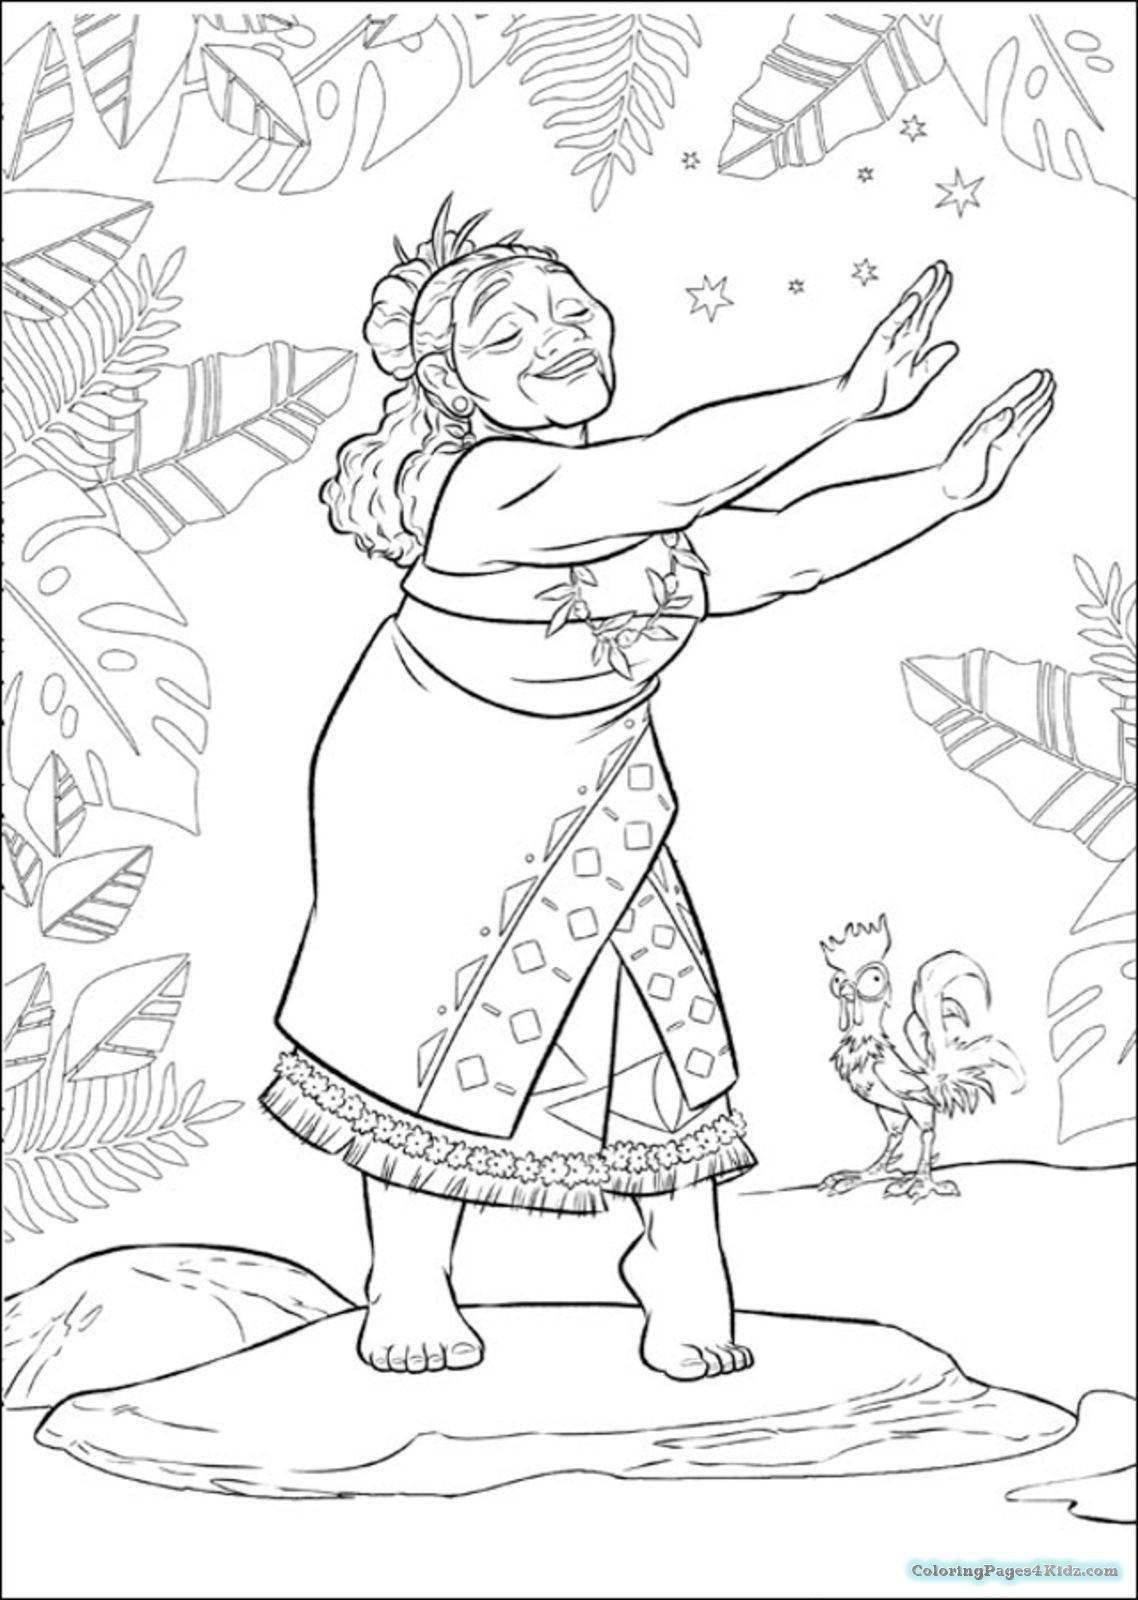 Gramma Tala Disneys Moana Coloring Pages